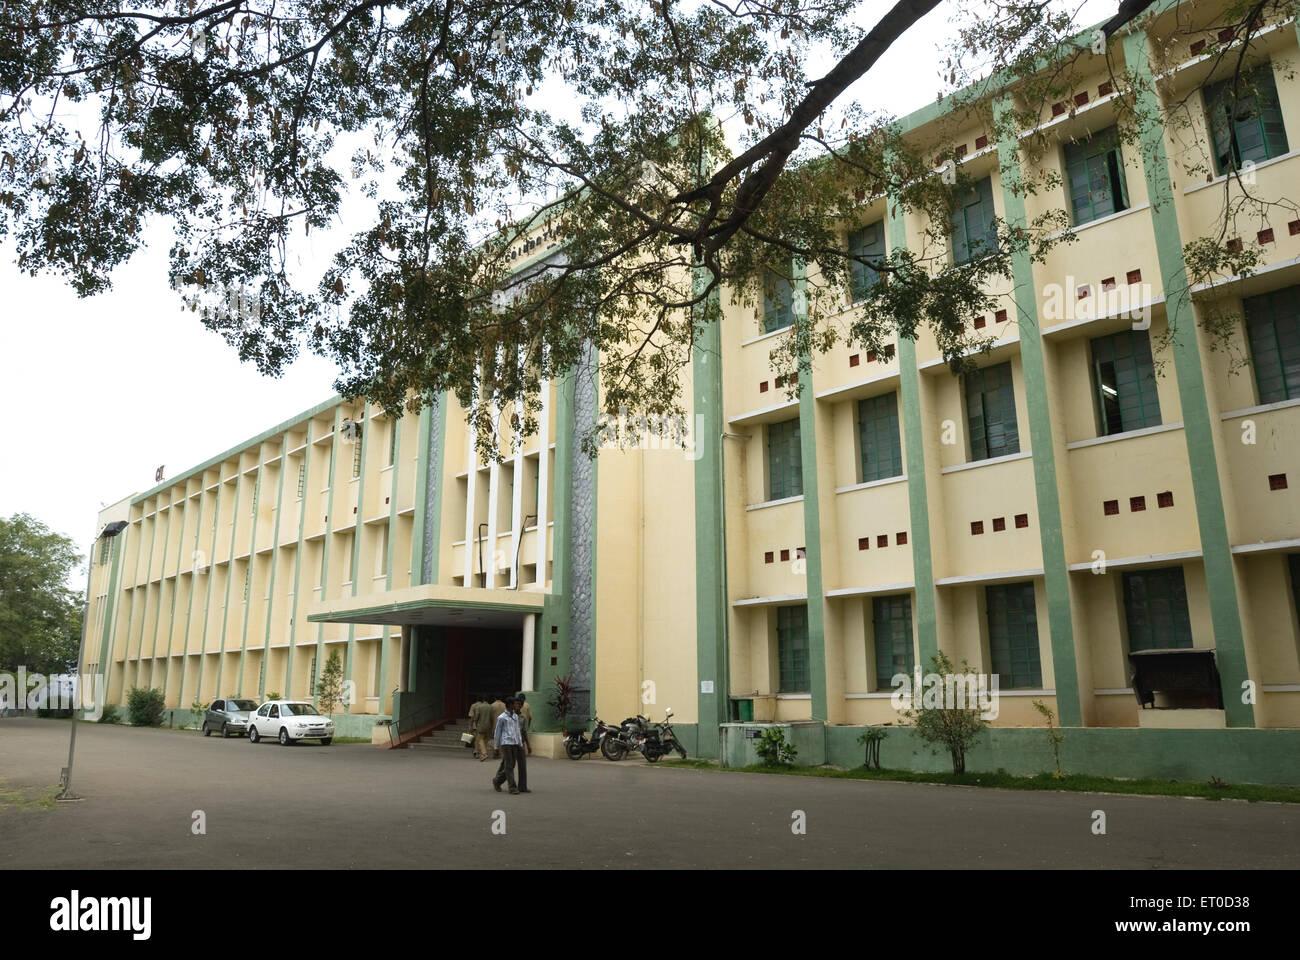 Coimbatore Institute of technology college di ingegneria ; Tamil Nadu ; India Immagini Stock